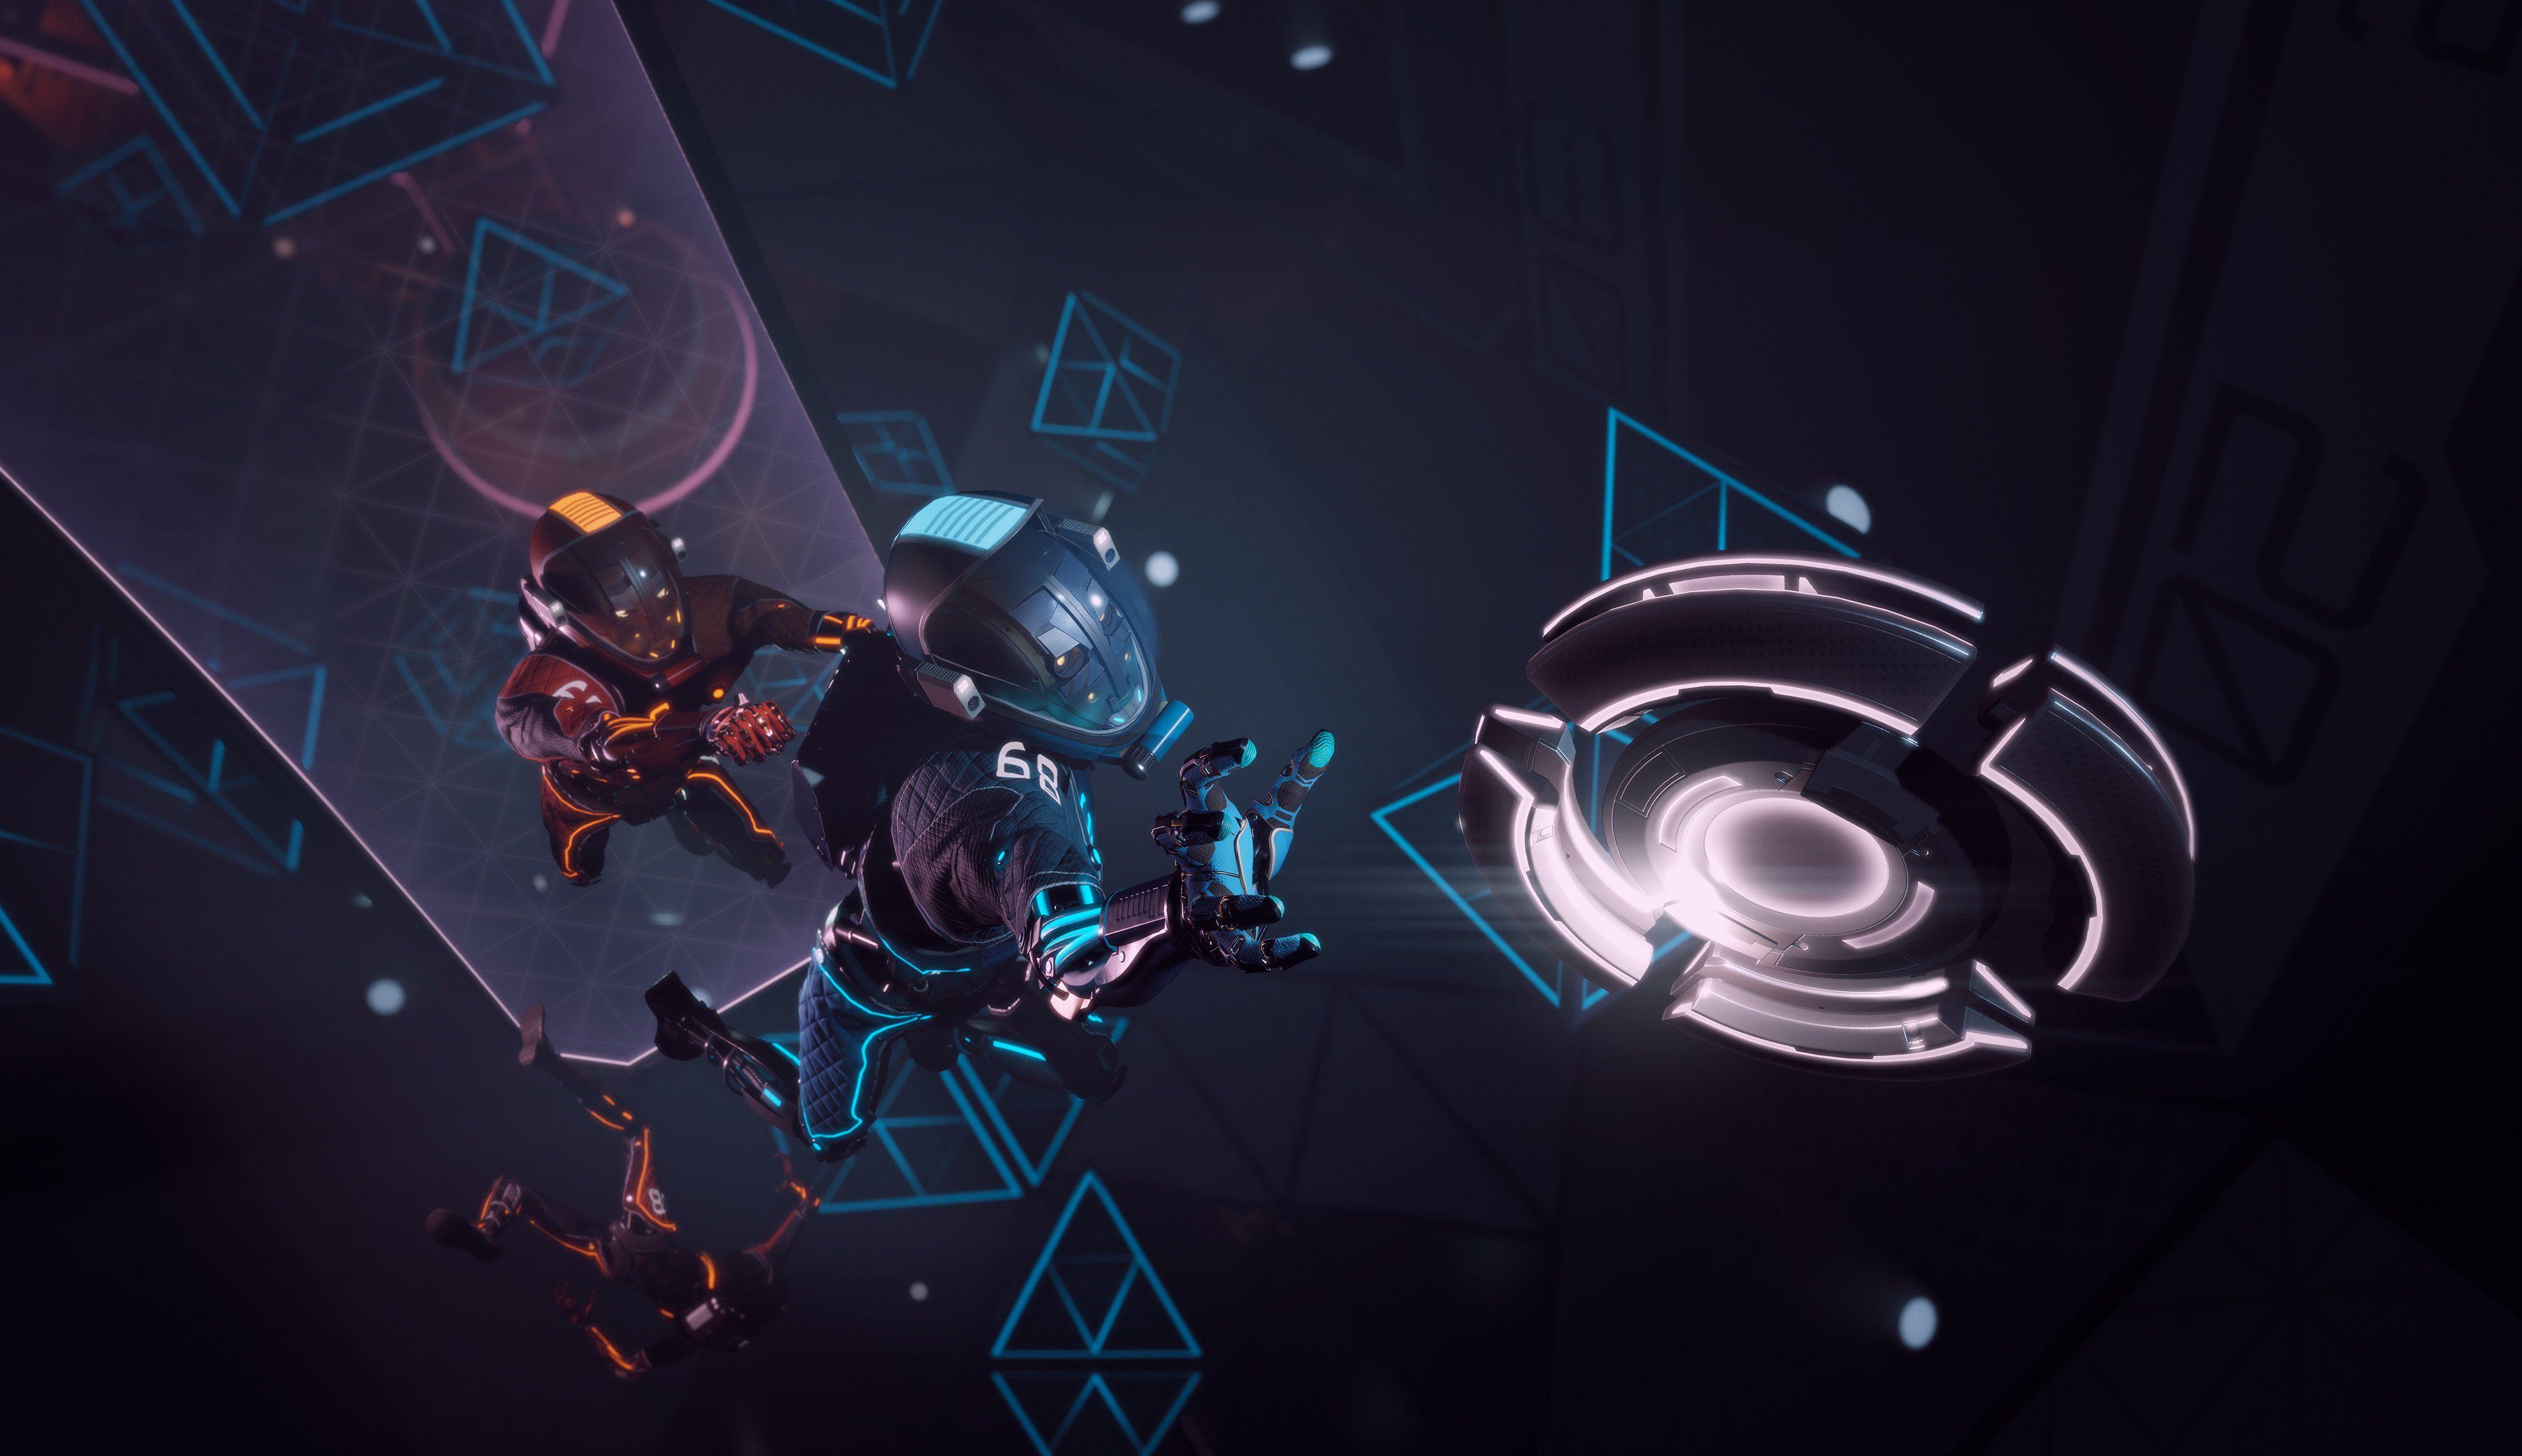 Oculus Quest Gets Port Of Echo Arena Oculus Bmw I8 Keys Art